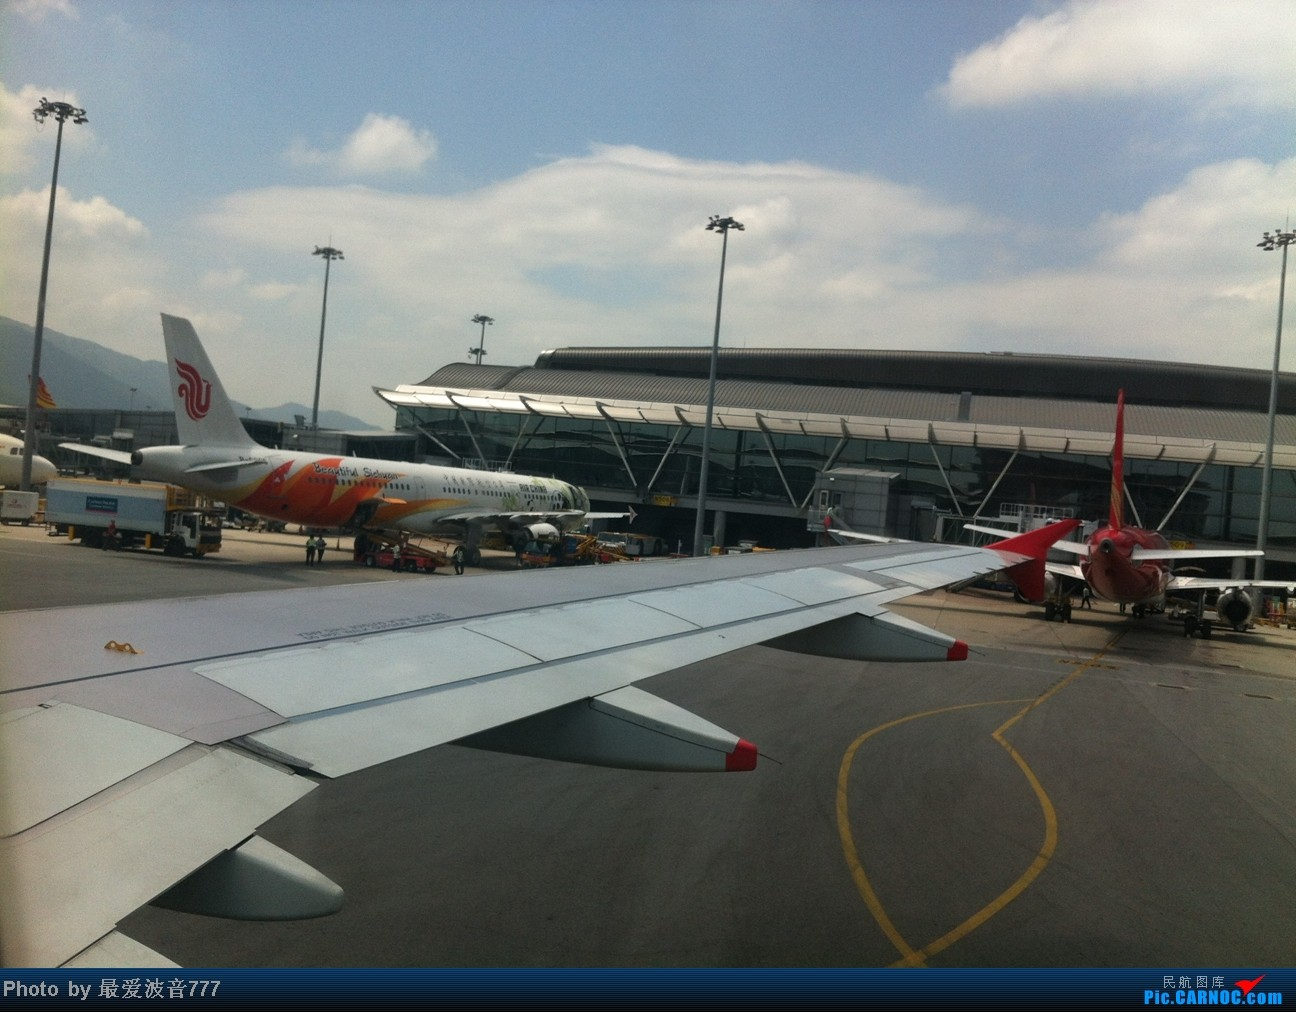 Re:[原创]假期的回国往返之旅 LHR-HKG-CTU-HKG-LHR, CX+CA+KA联合运营 AIRBUS A321-200 B-6365 中国香港赤鱲角国际机场